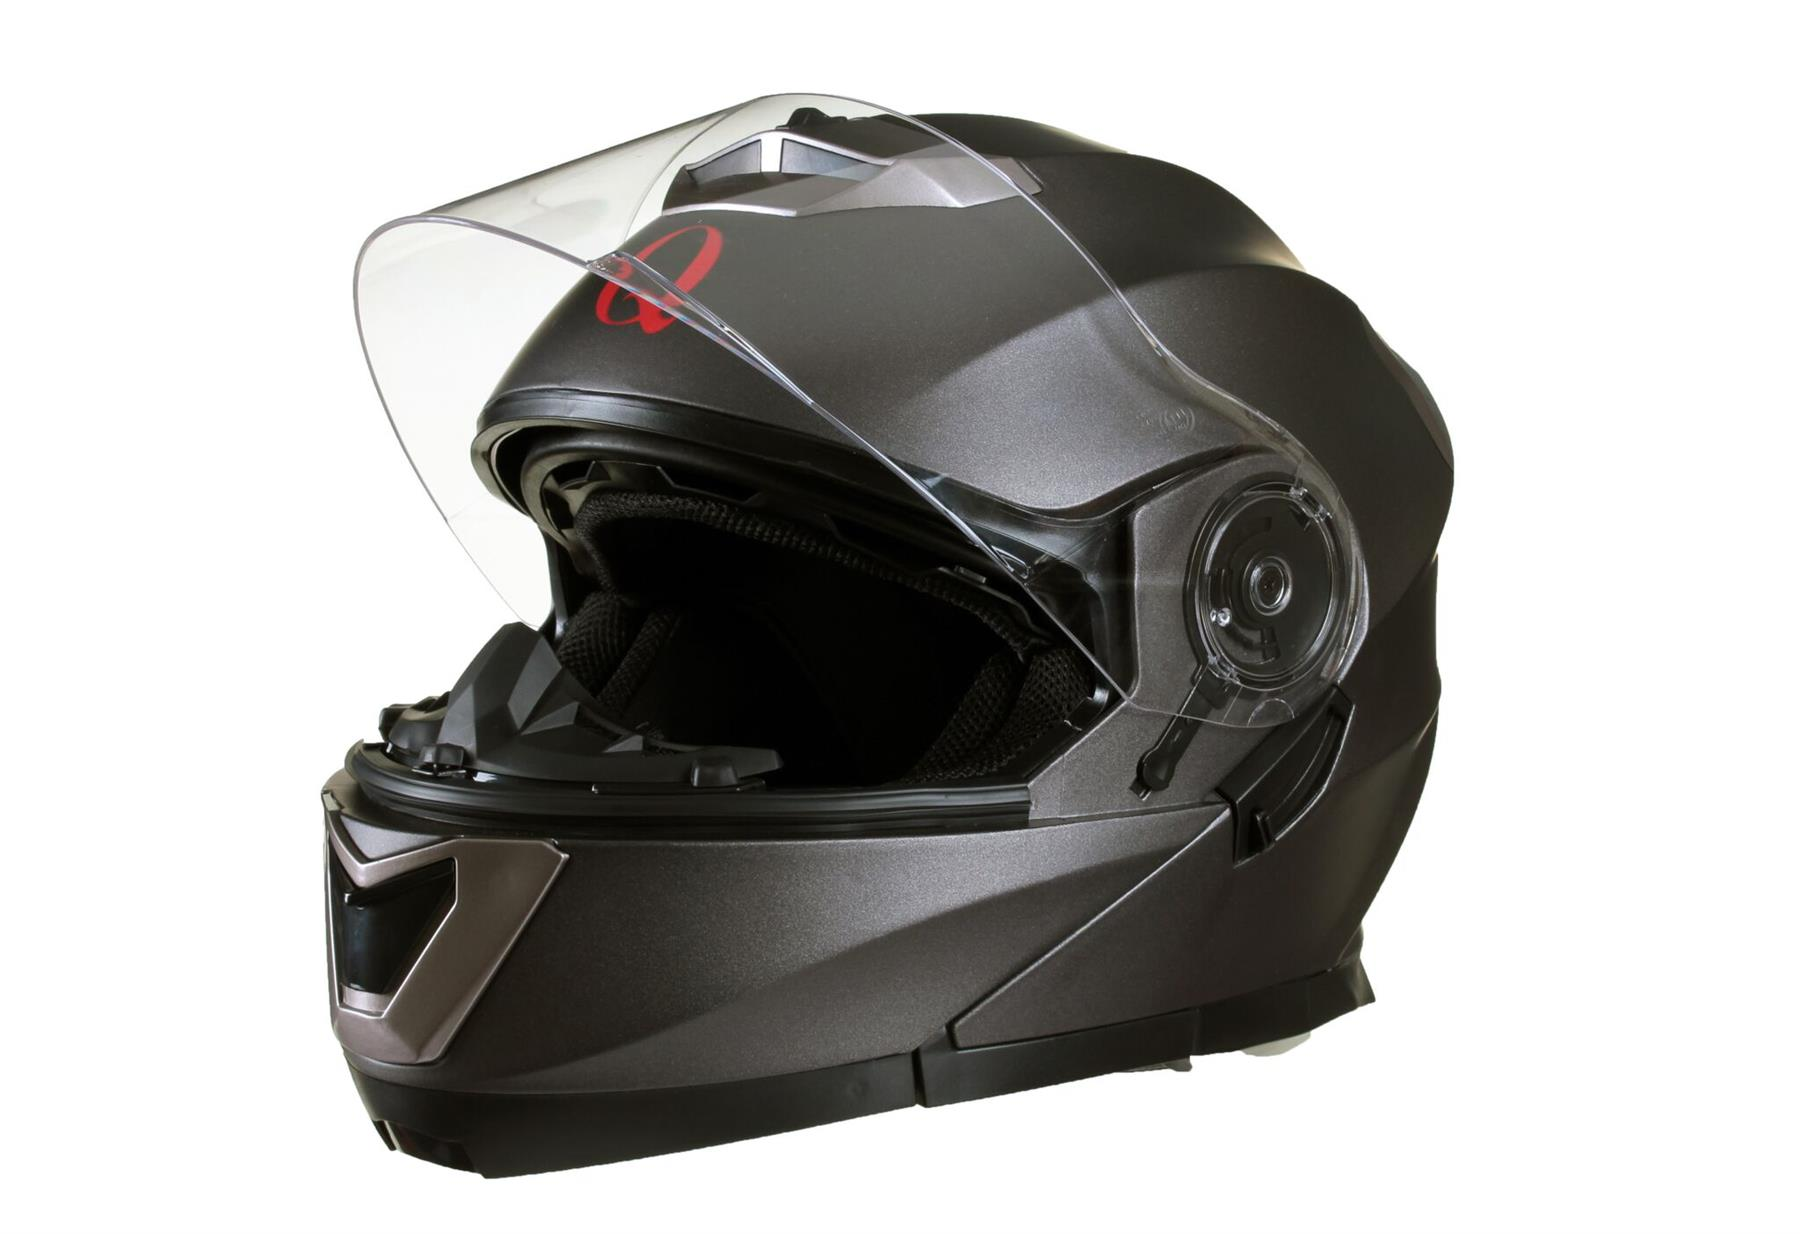 MODULAR-Flip-up-Front-Helmet-DOUBLE-Visor-MOTORCYCLE-Motorbike-Colour-CHOICE miniature 13